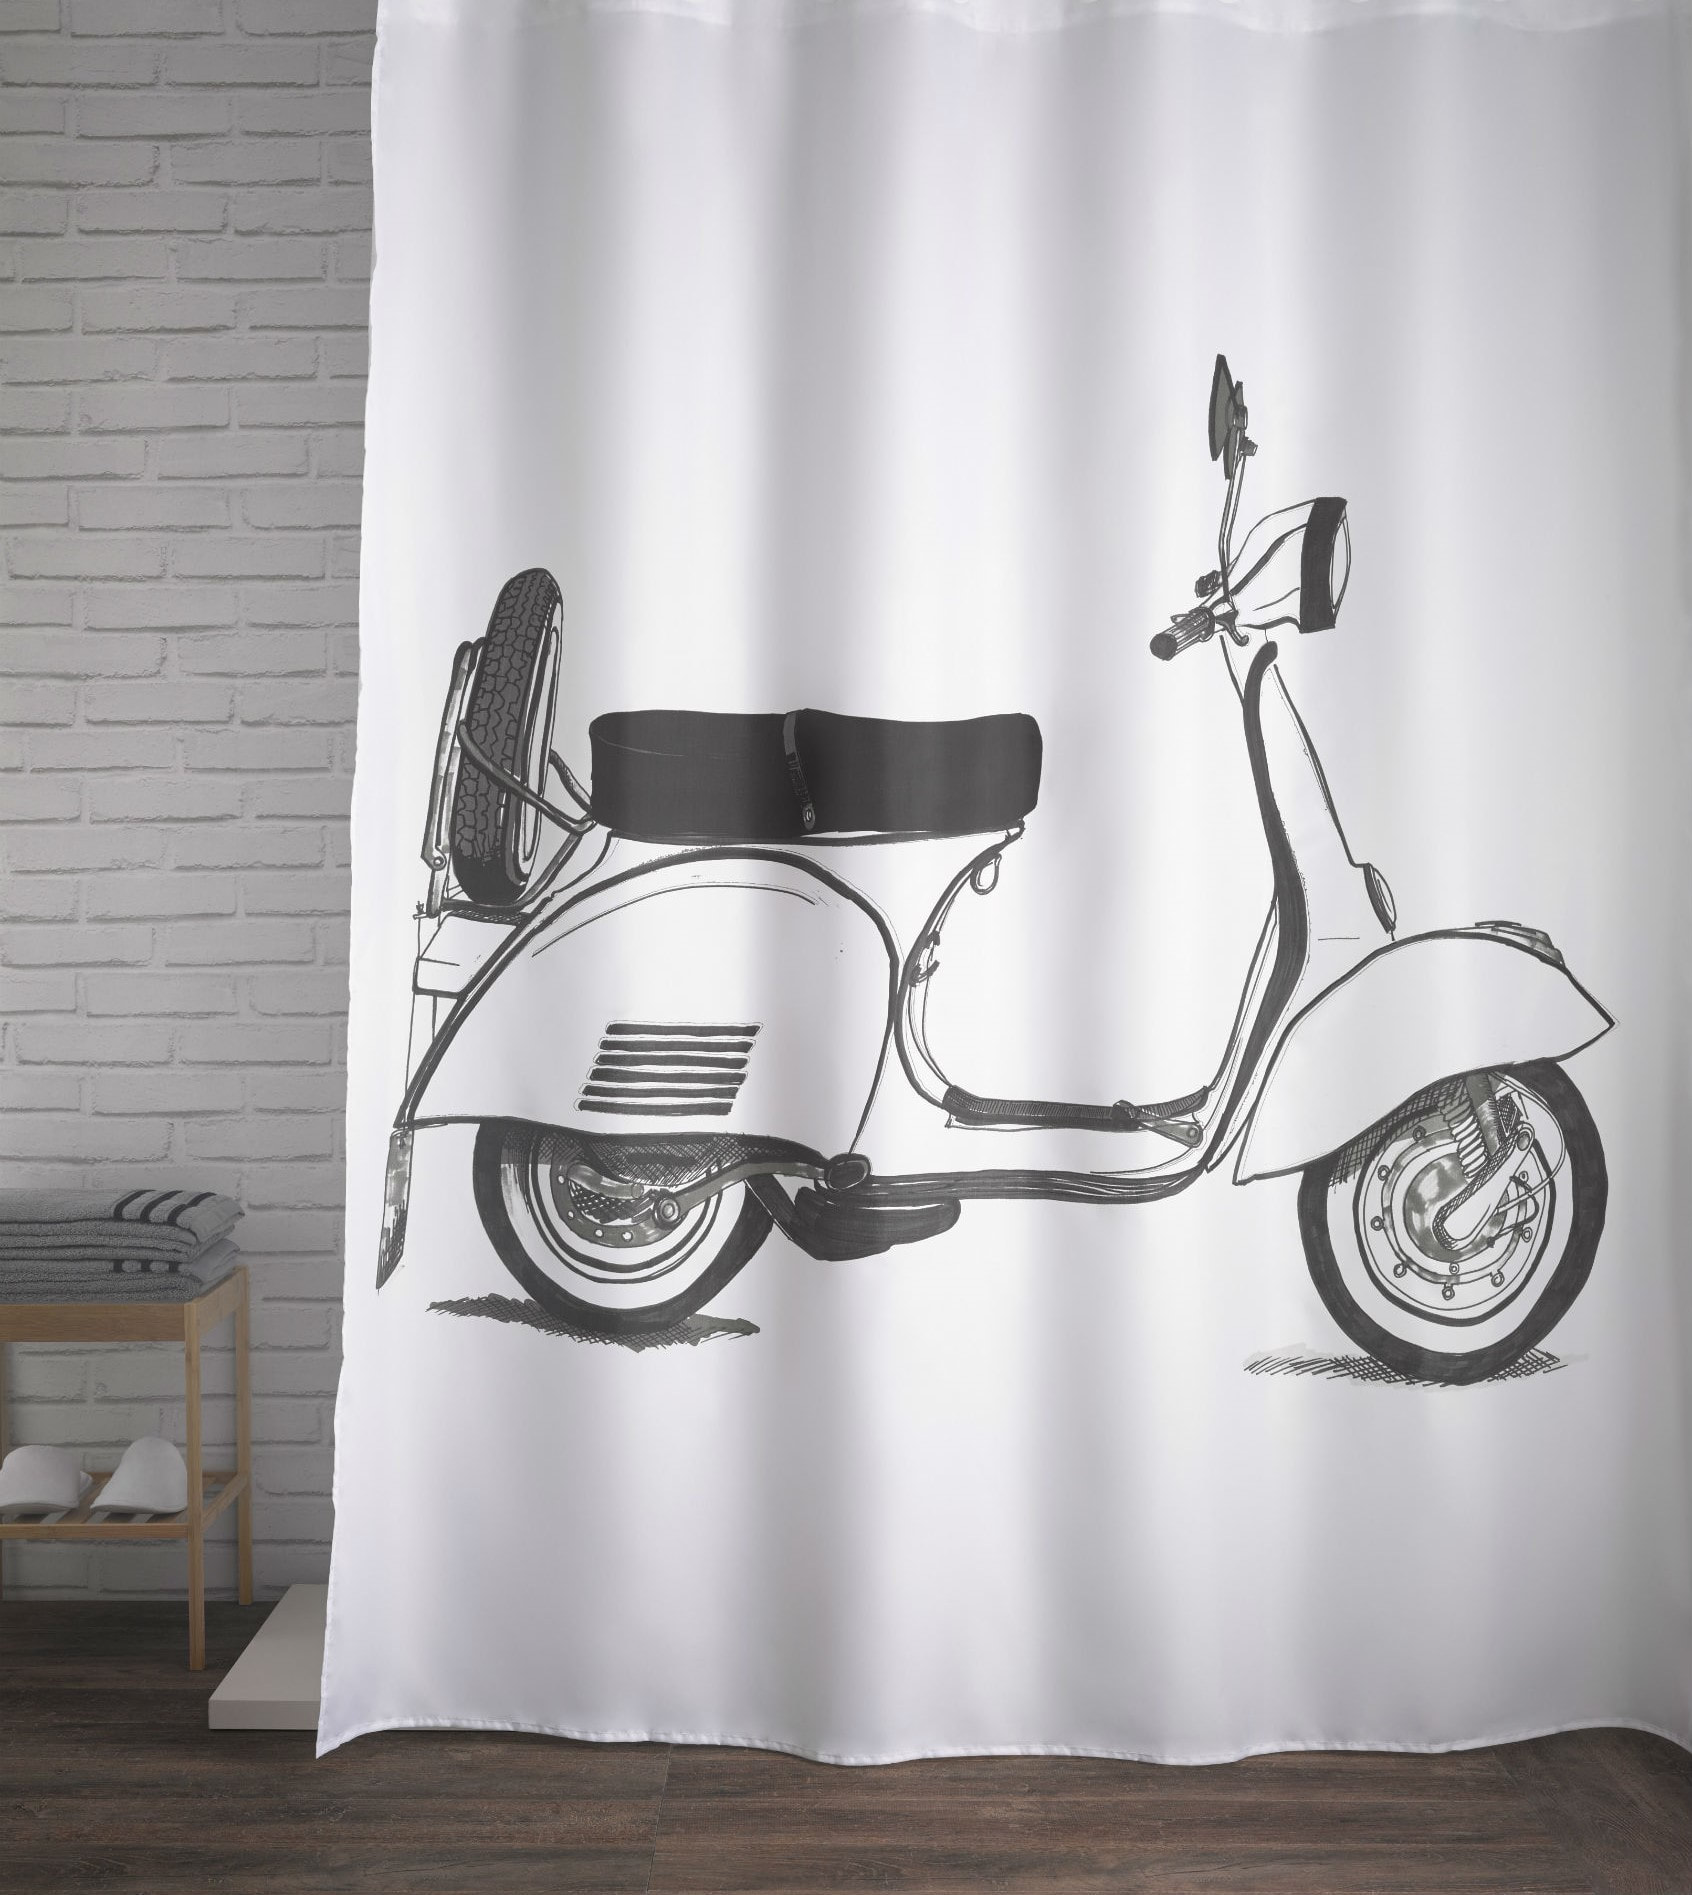 Classic Vespa Black White Shower Curtain European Classic Bathroom Decor Home Decor Gifts